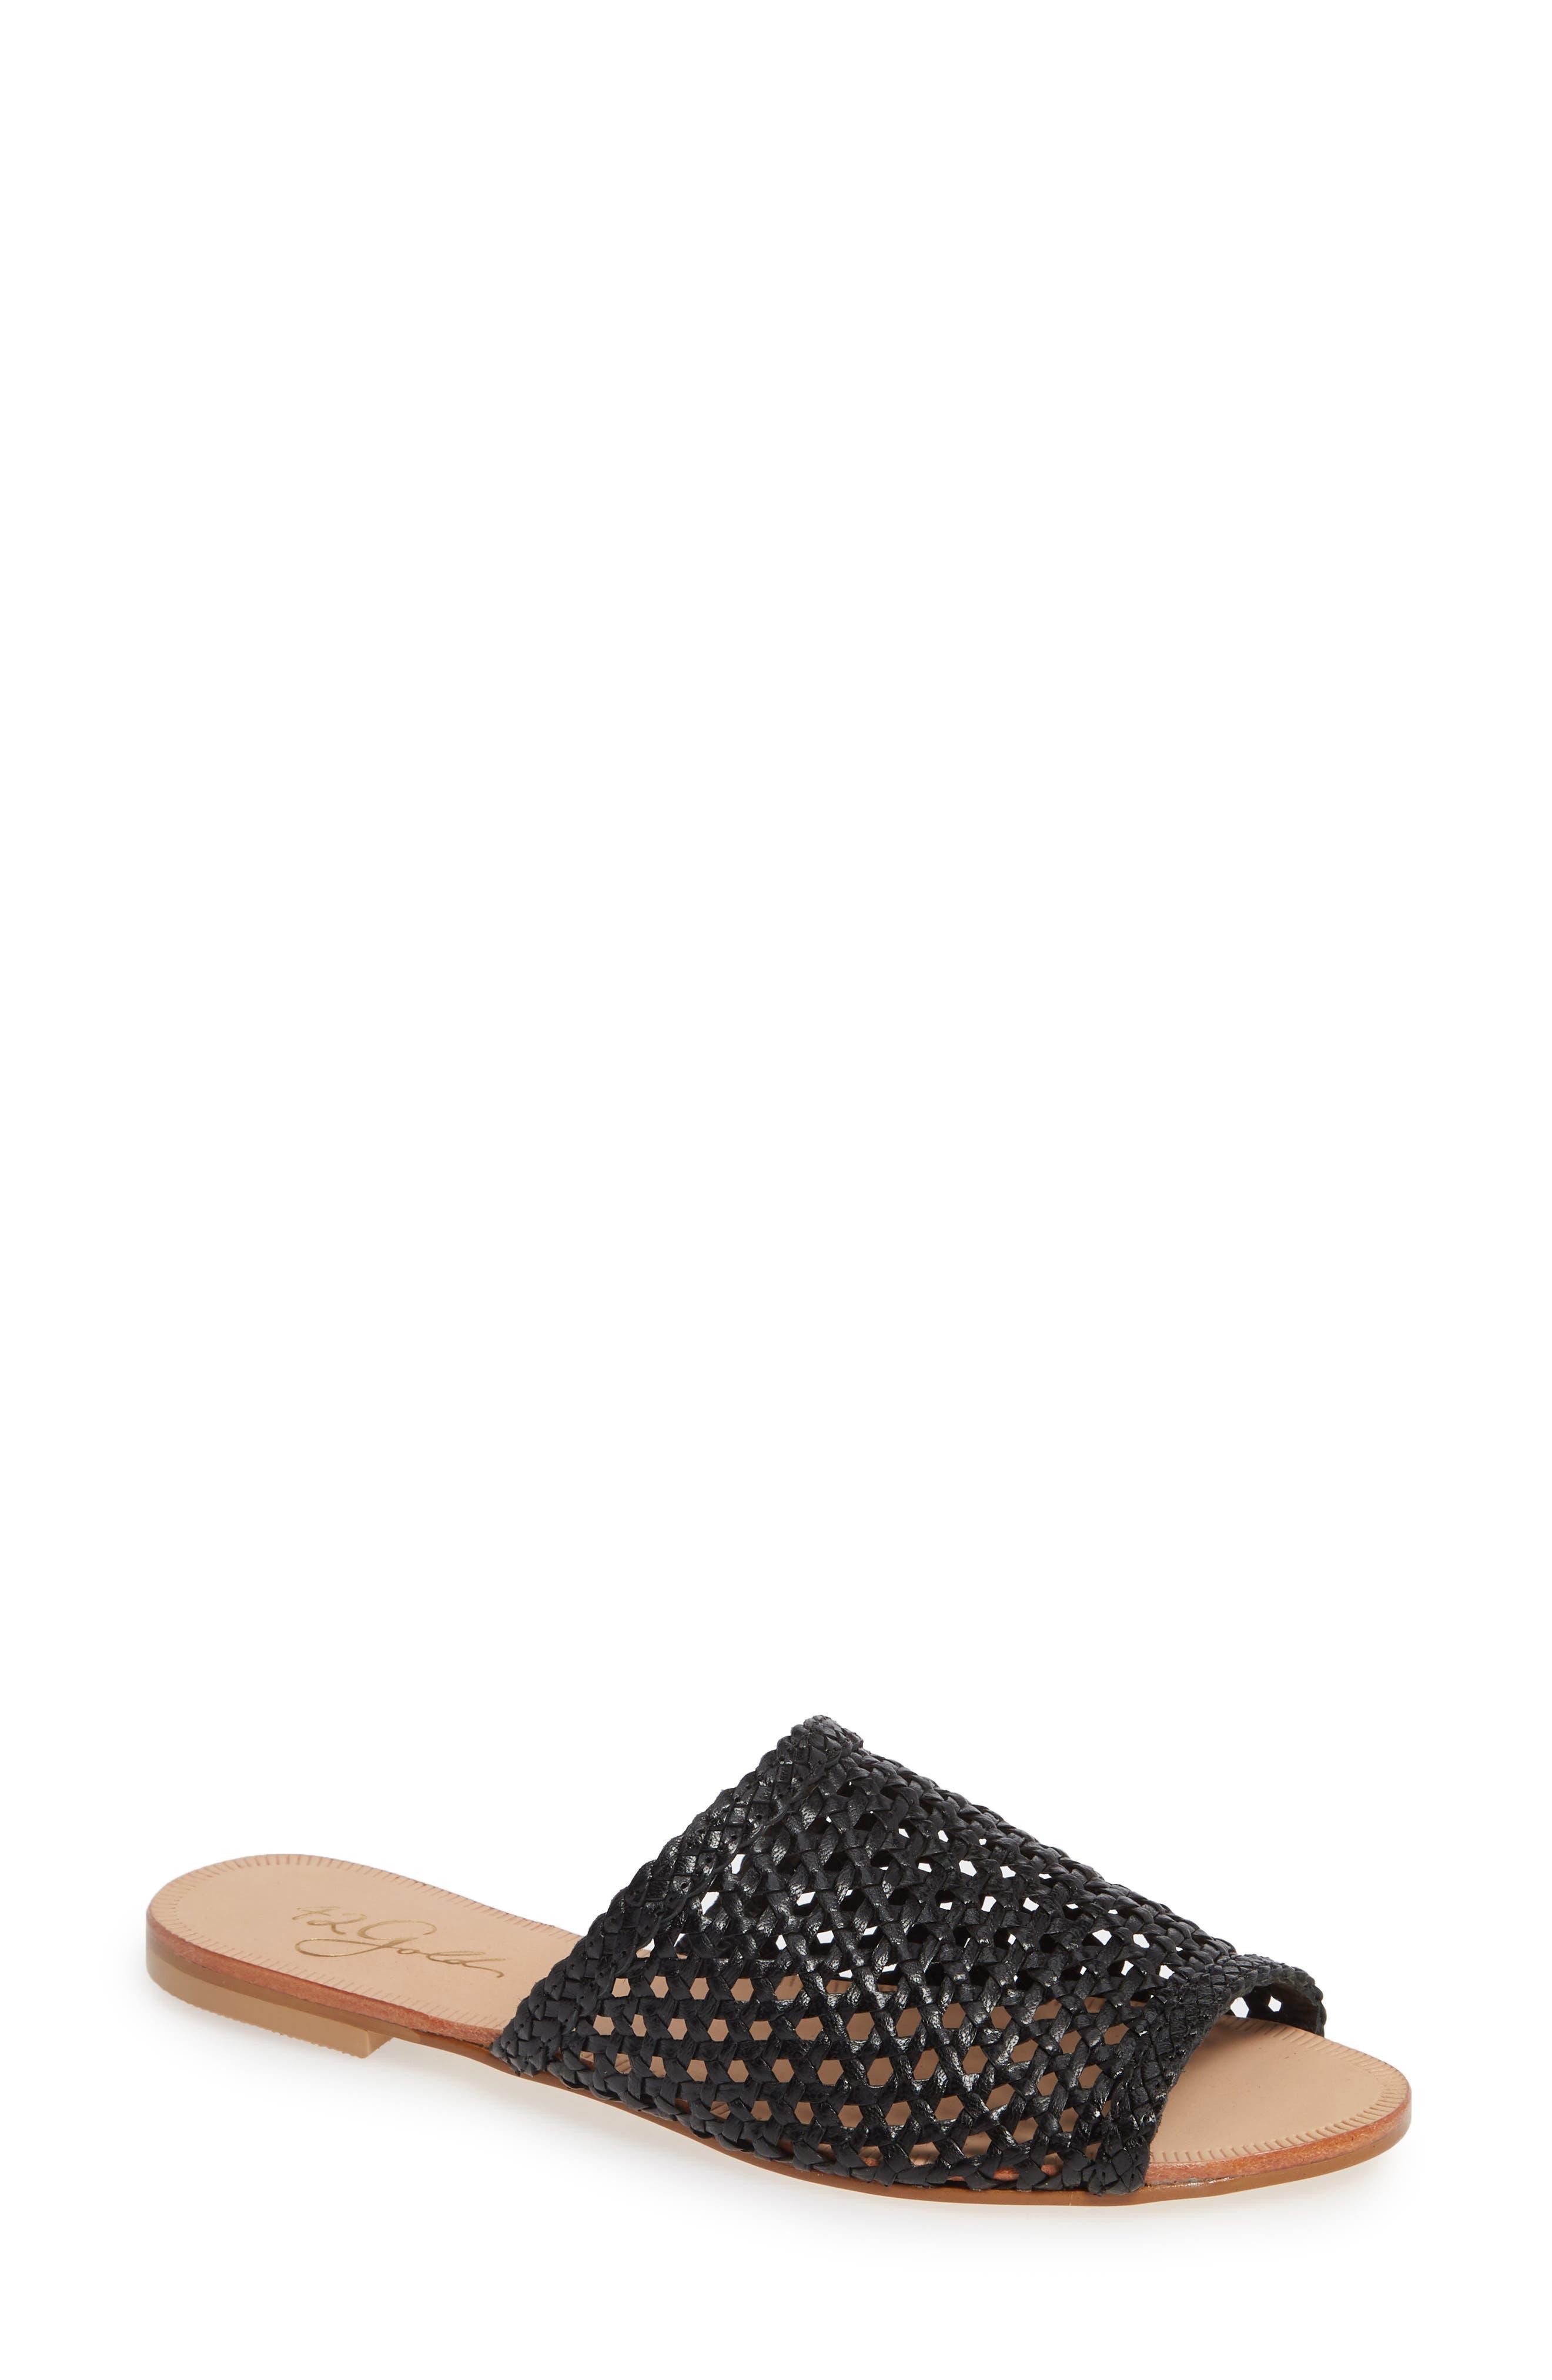 ,                             Begonia Slide Sandal (Women0,                             Main thumbnail 1, color,                             BLACK LEATHER